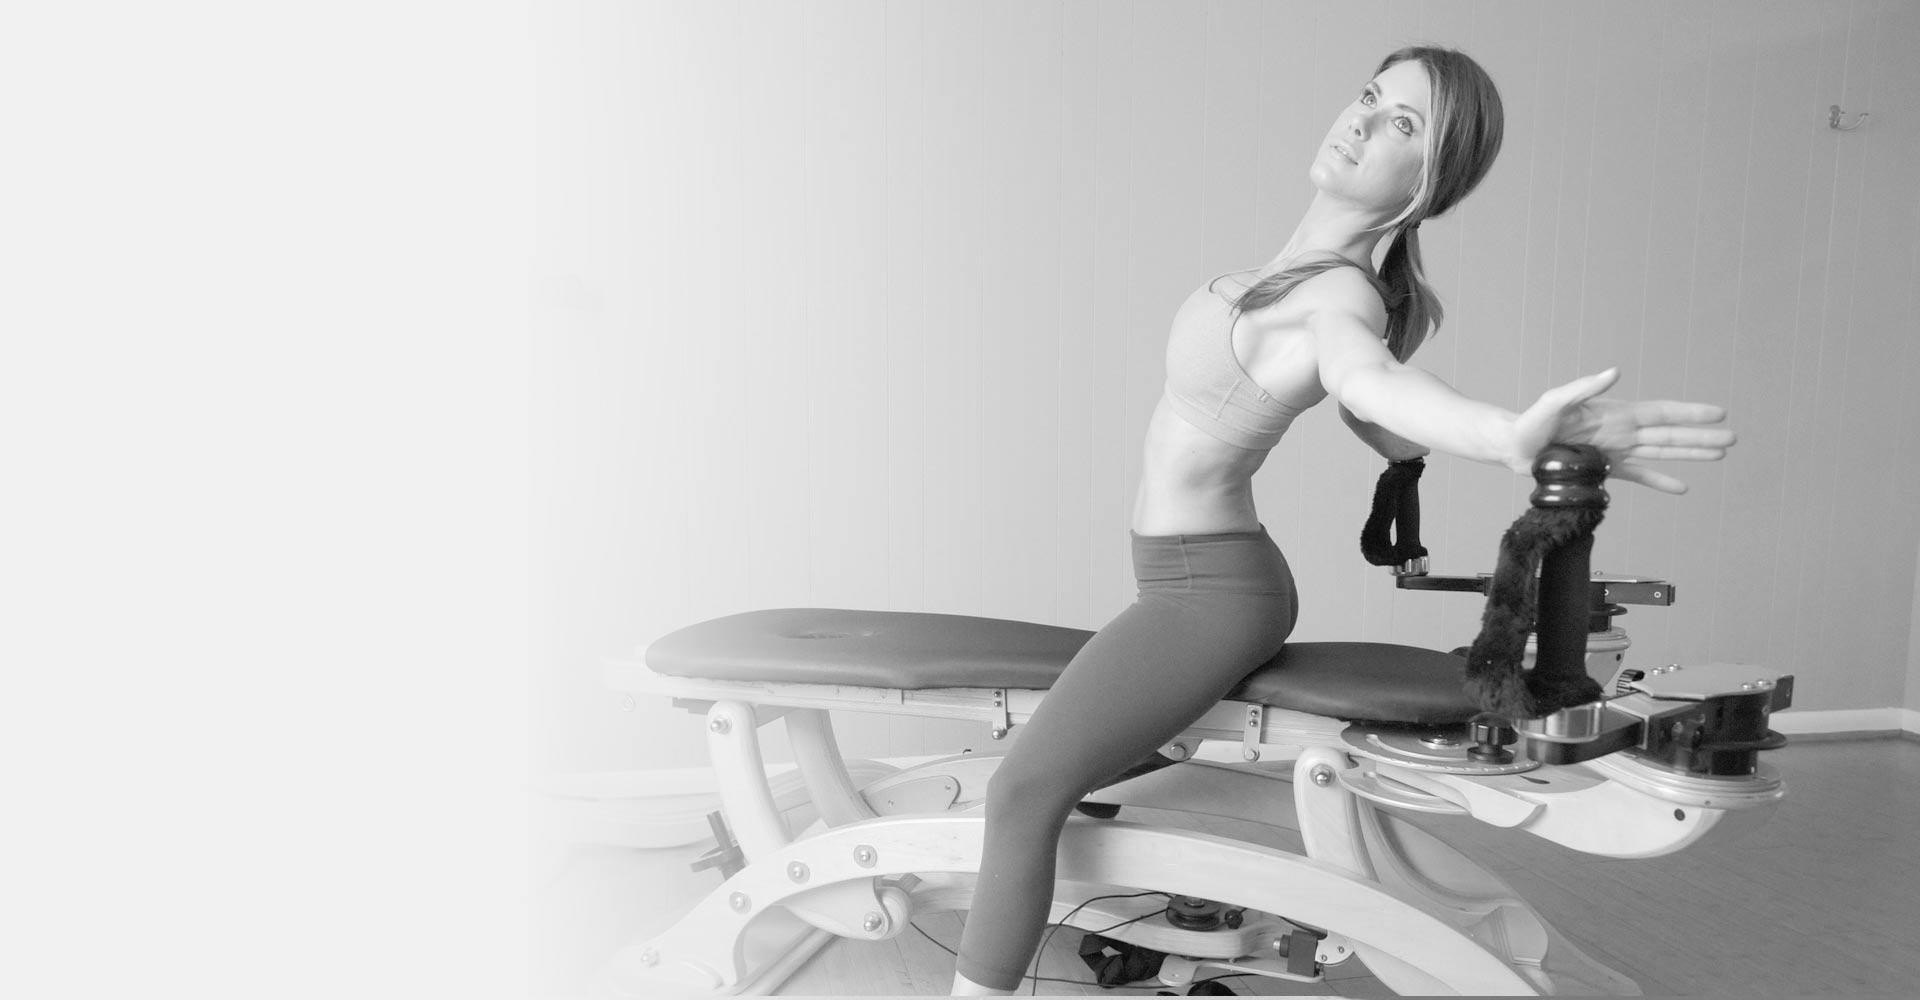 Gyrotonic, la disciplina che fonde yoga, danza e nuoto